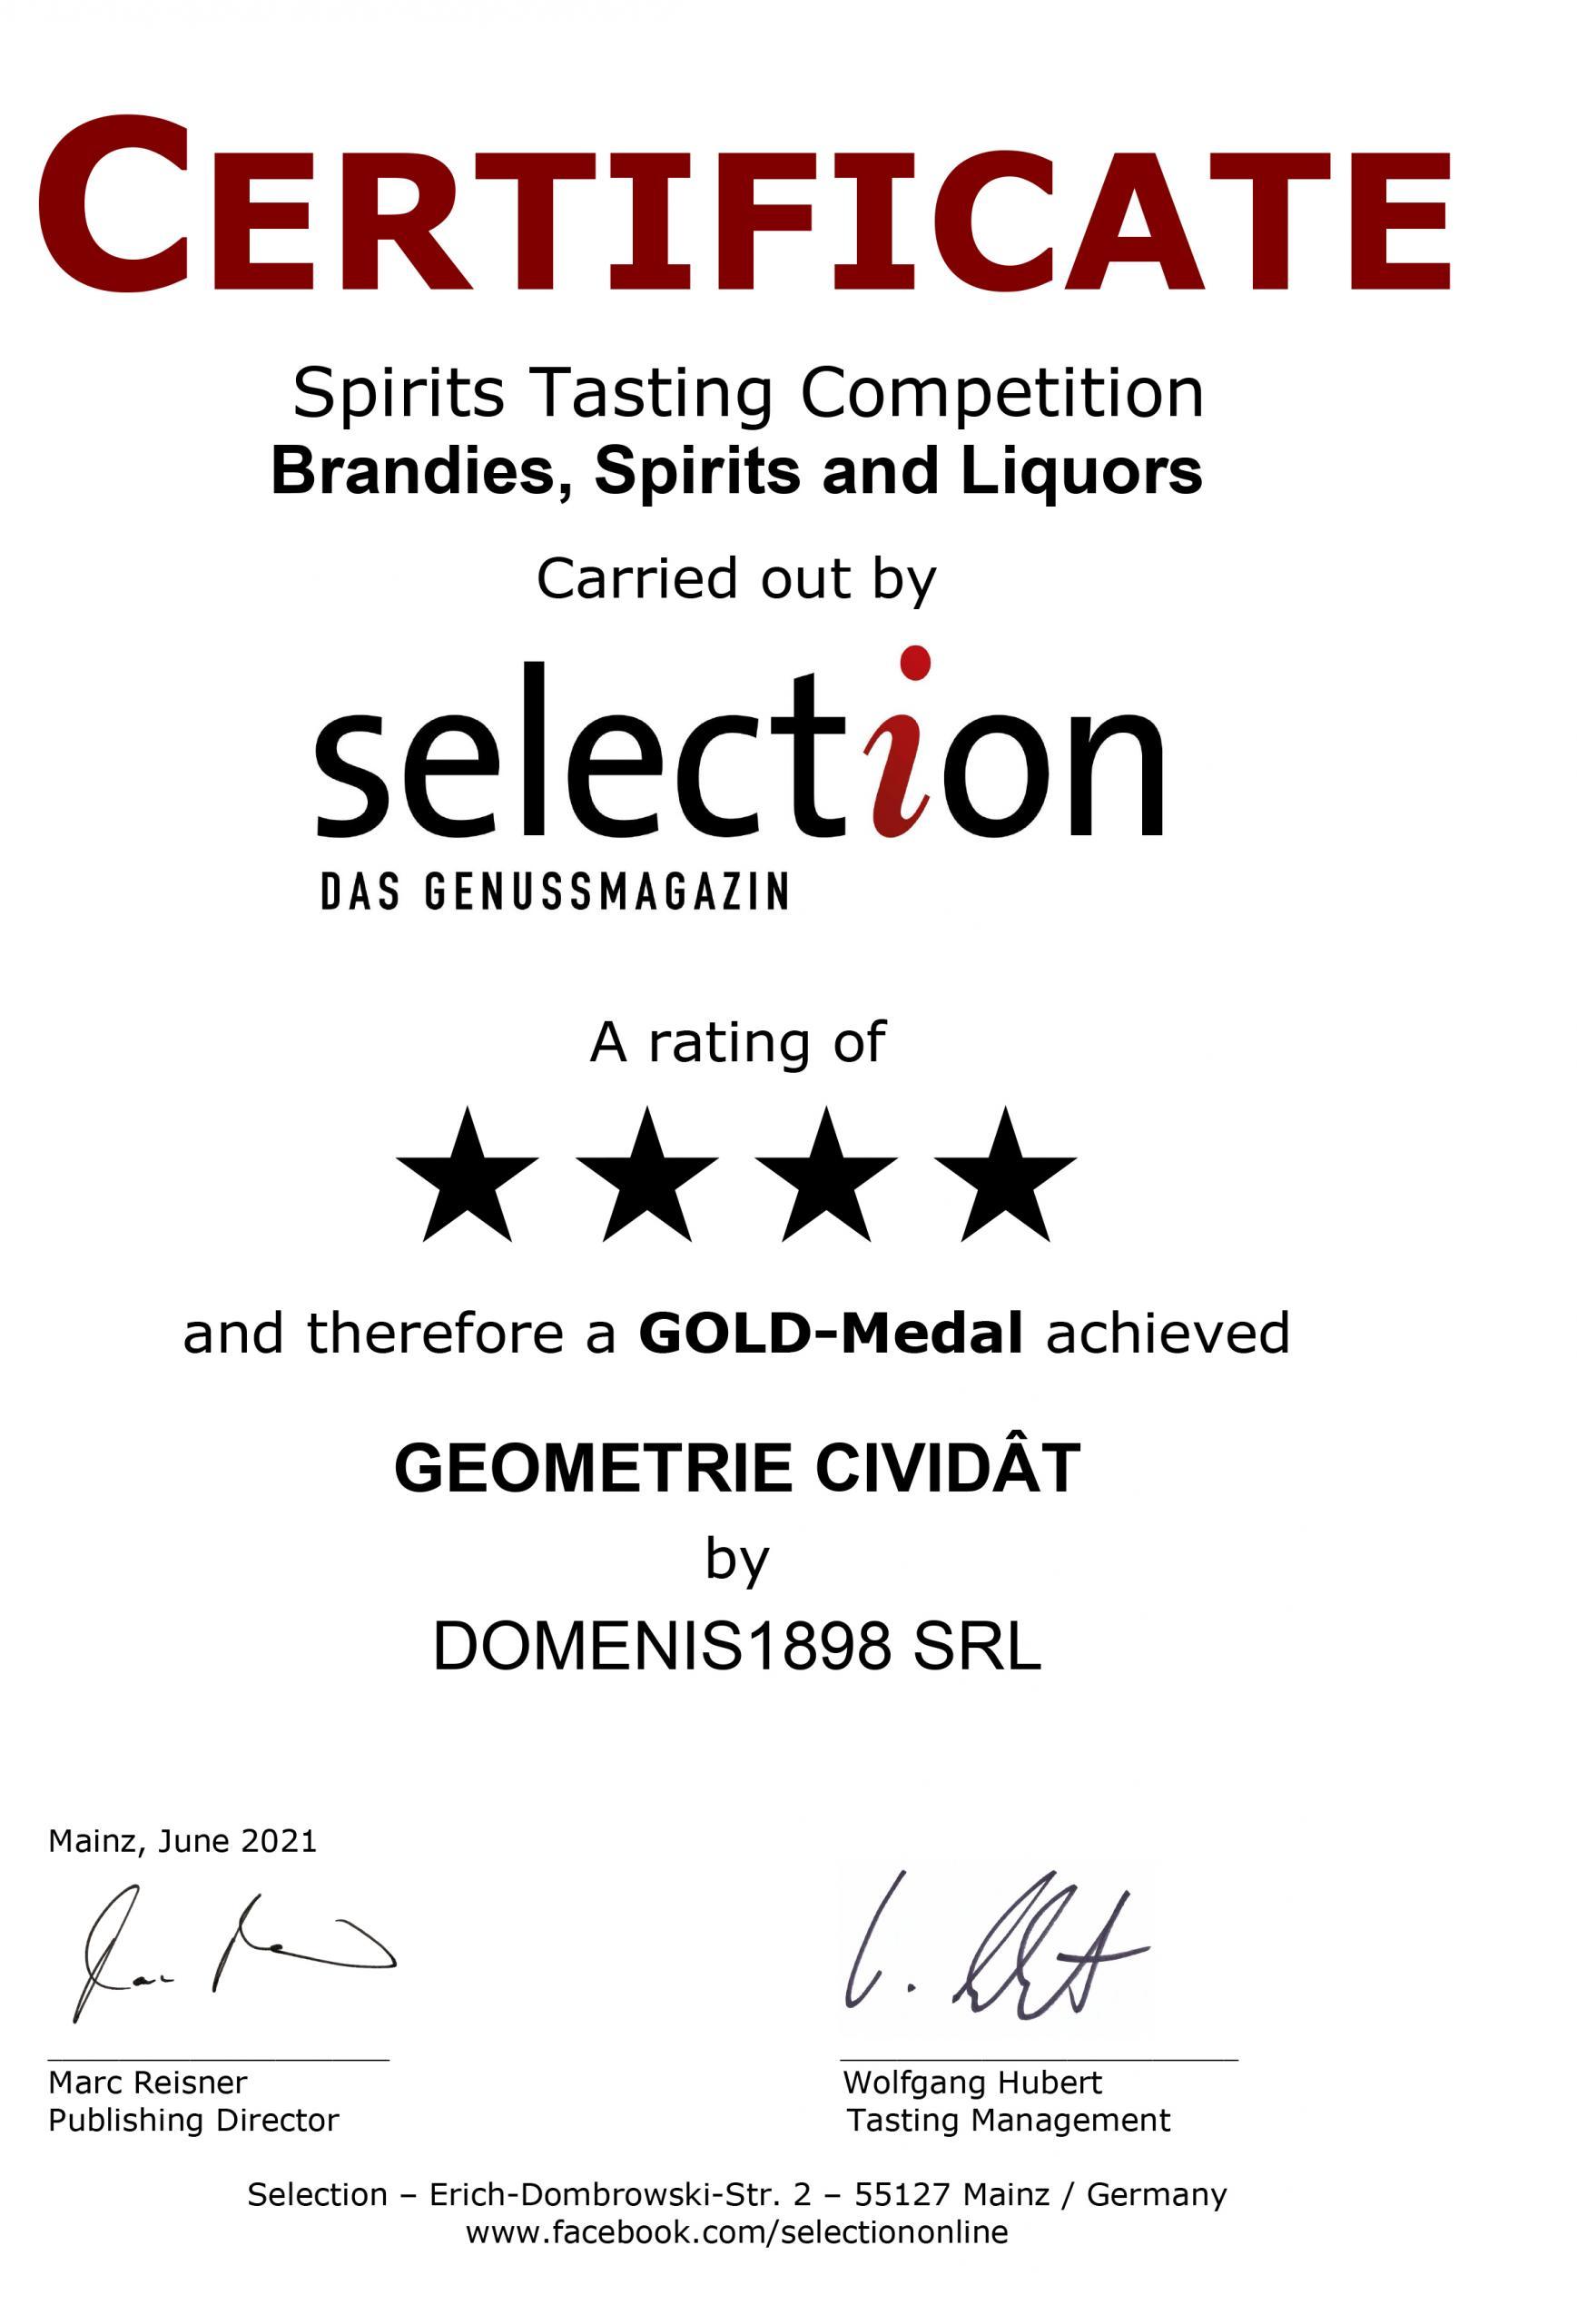 Selection aus Genussmagazin 2021 – Gold Medal – Geometrie Cividât